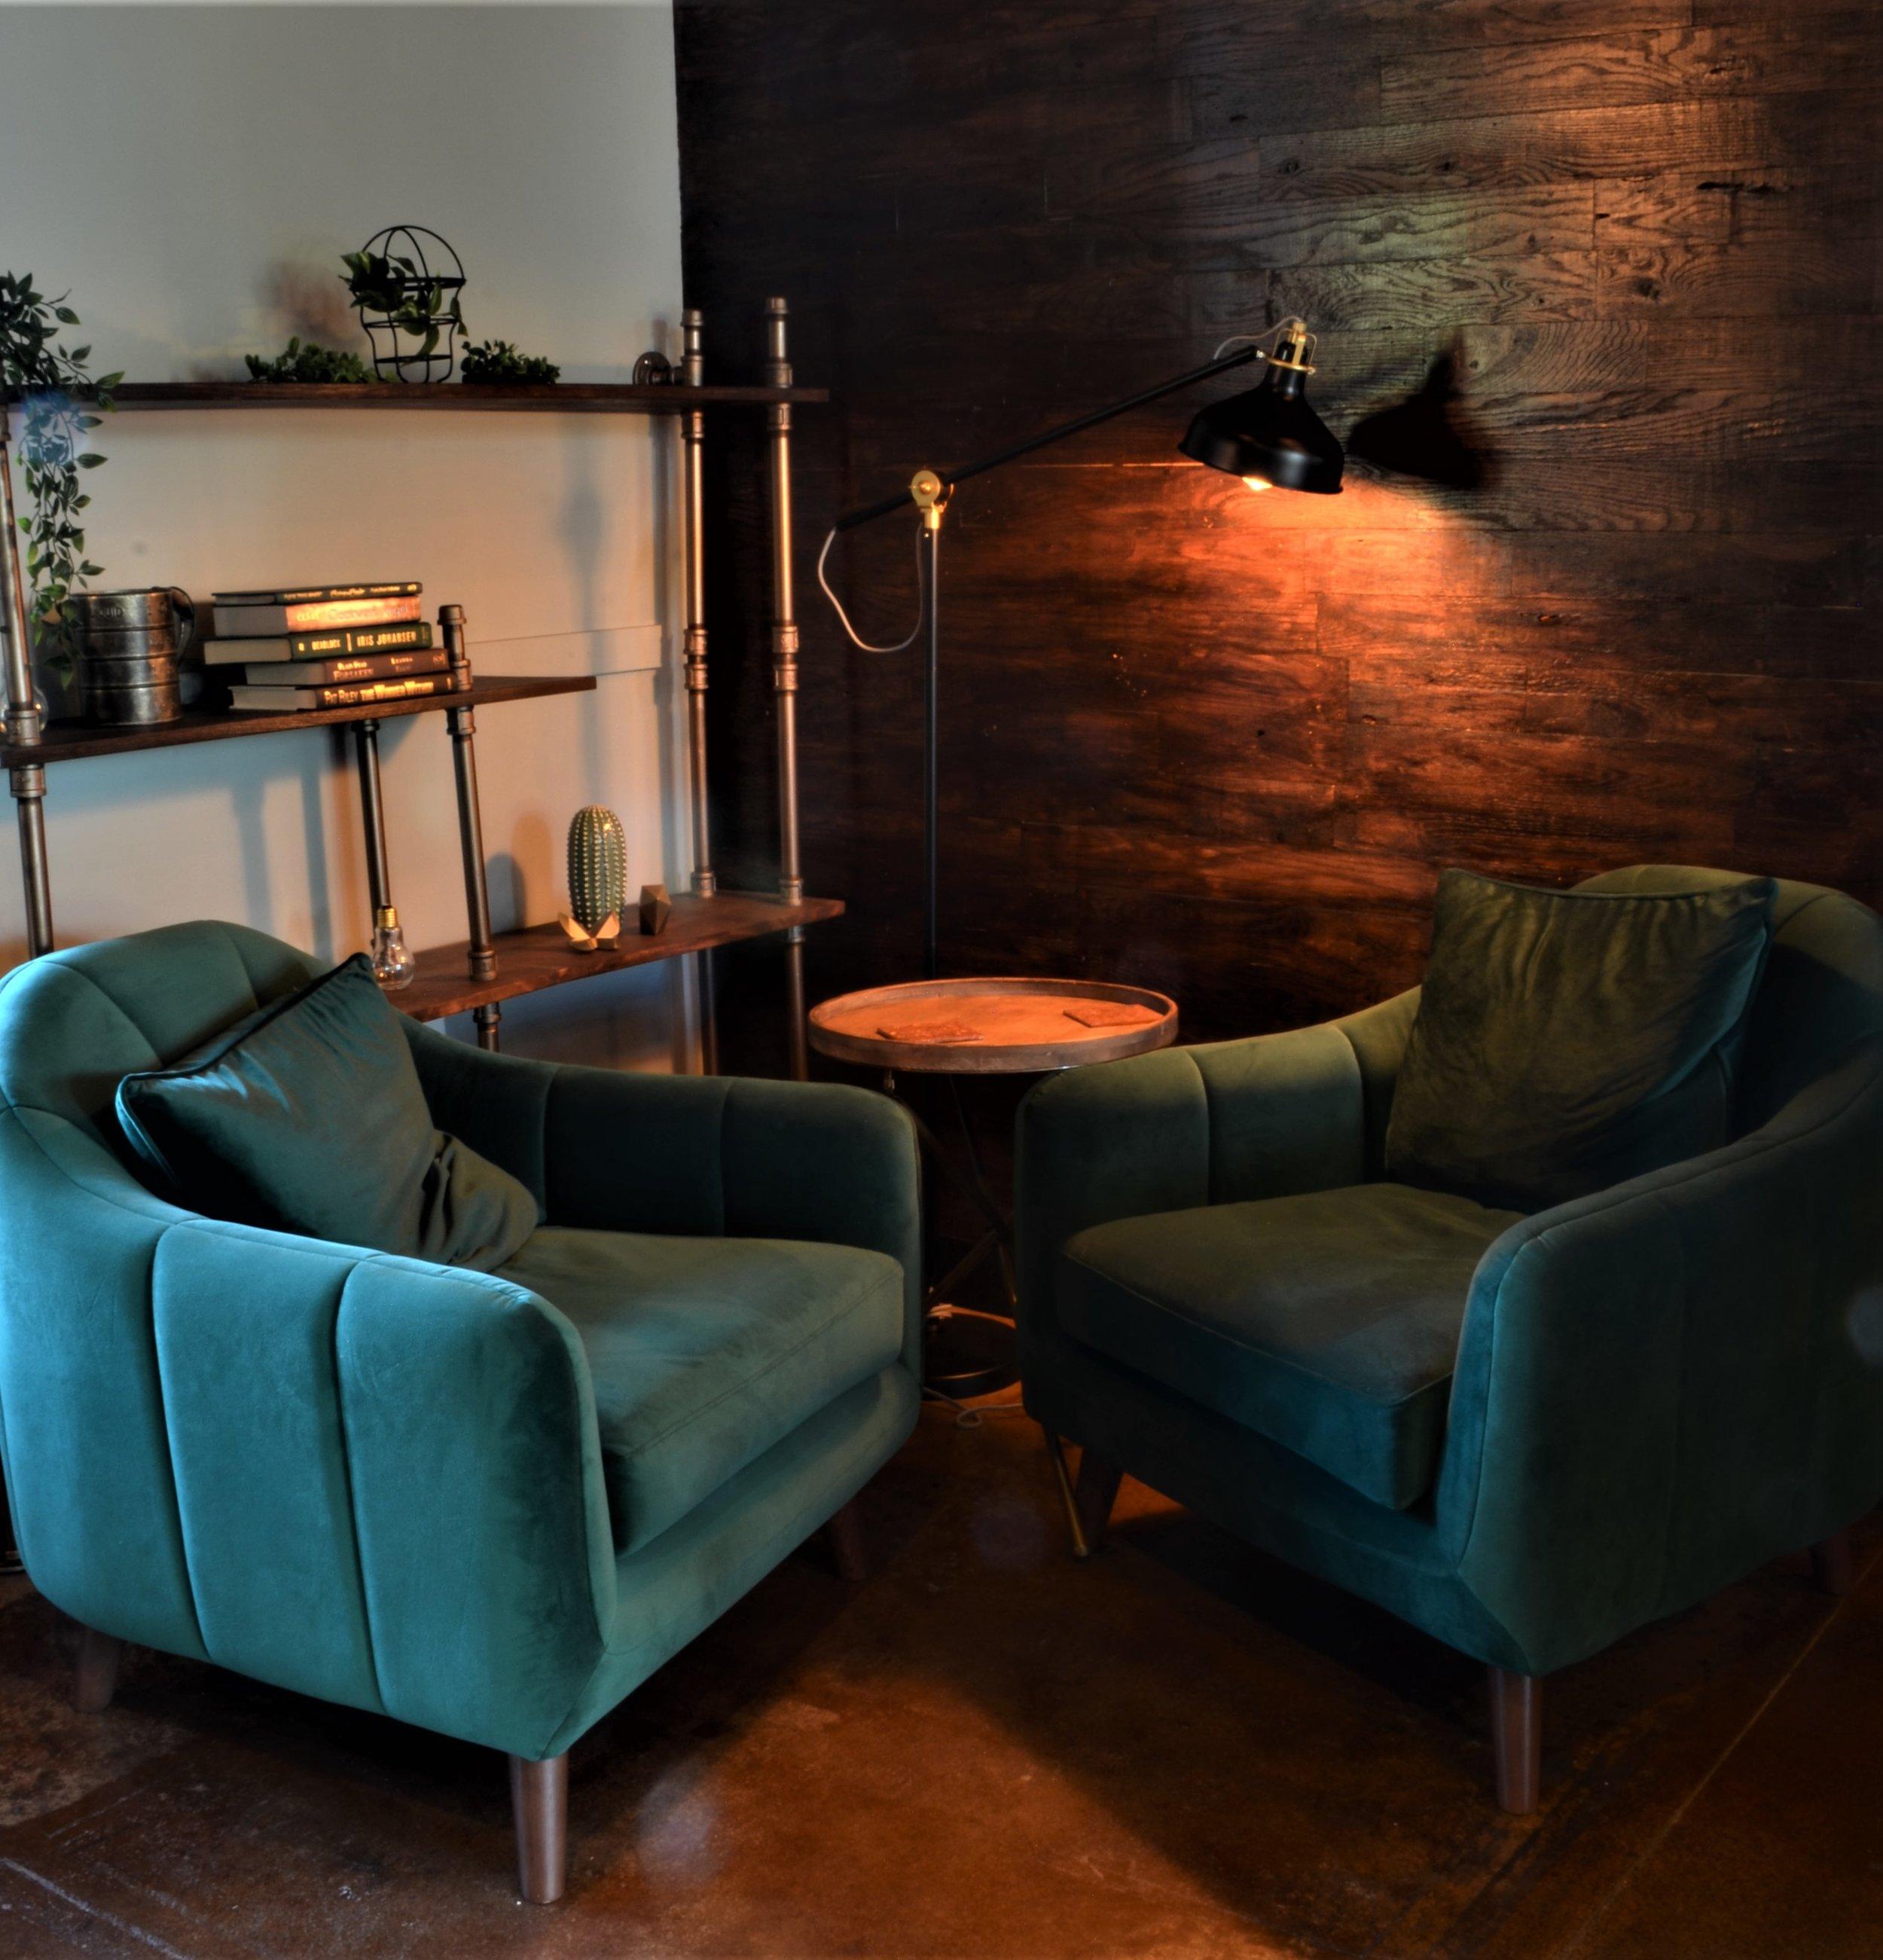 Study Nook 2 Chairs.JPG